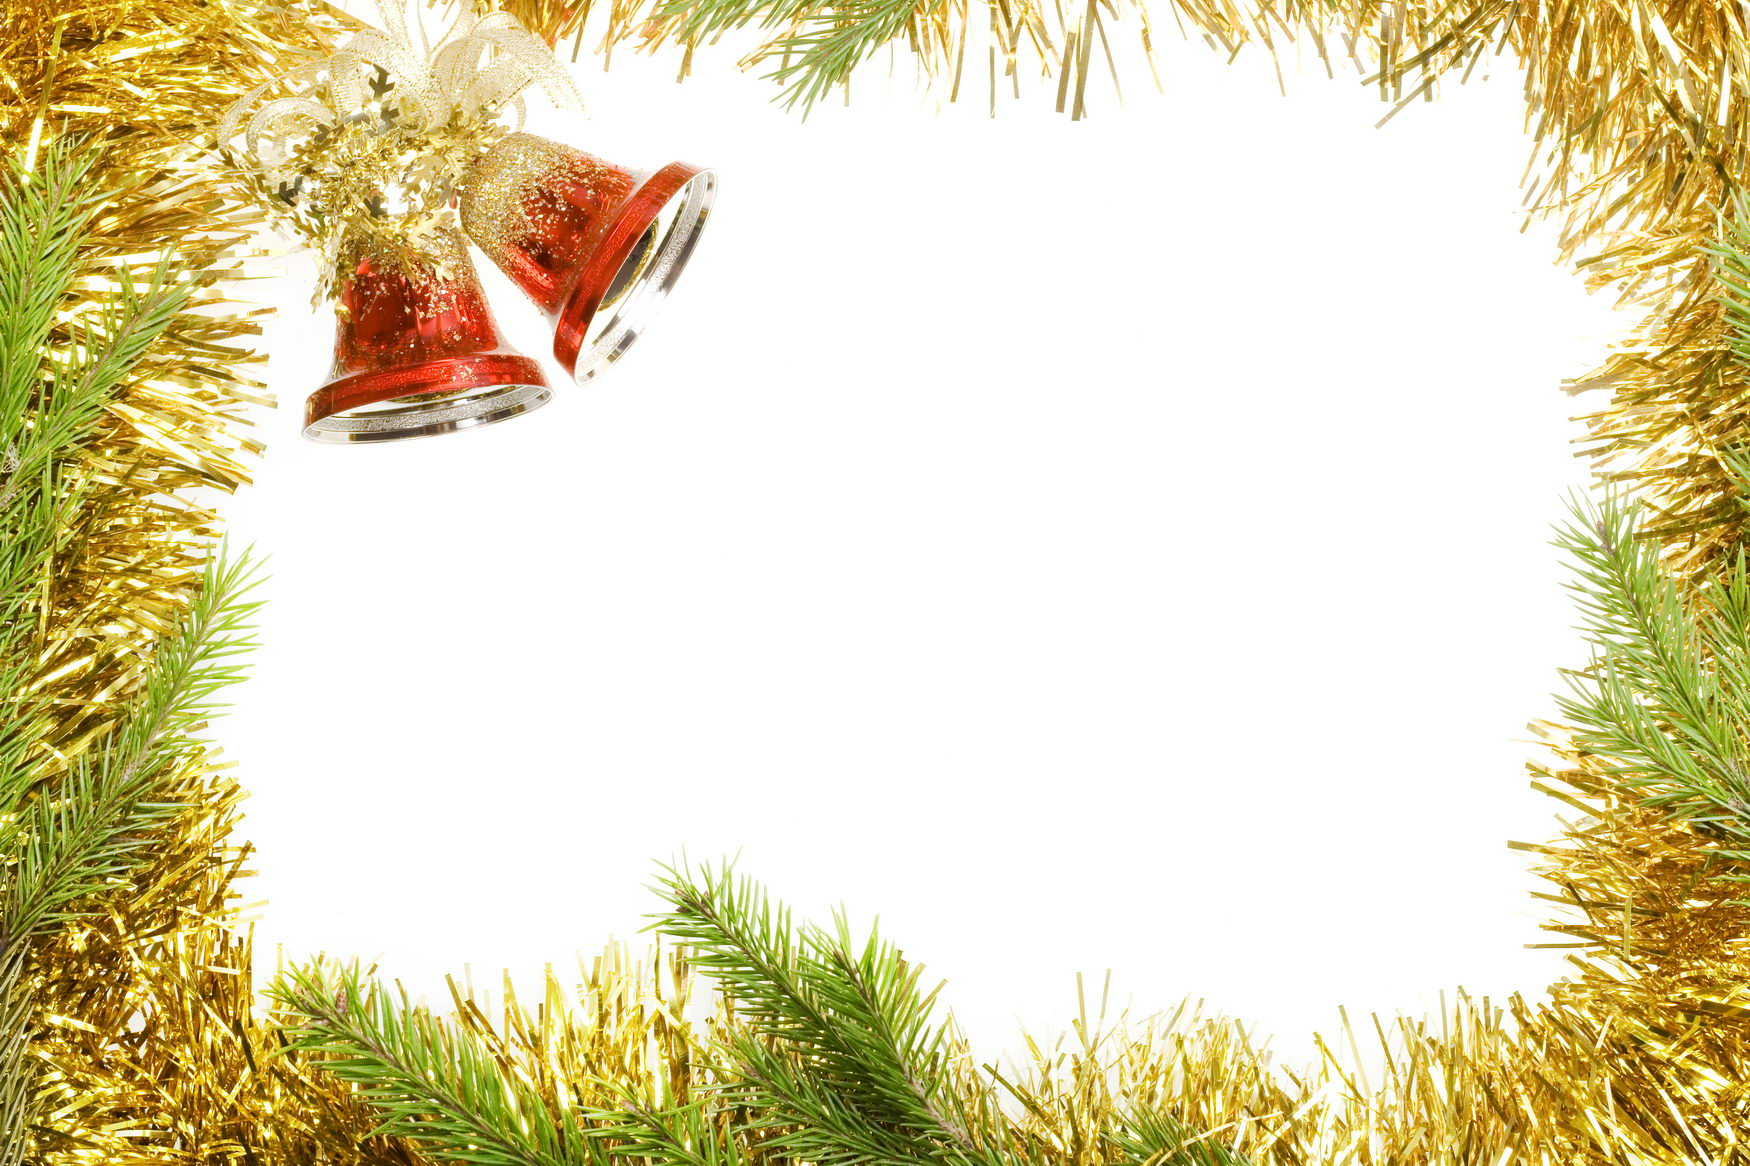 Christmas frame, Year, Isolated, Xmas, Winter, HQ Photo